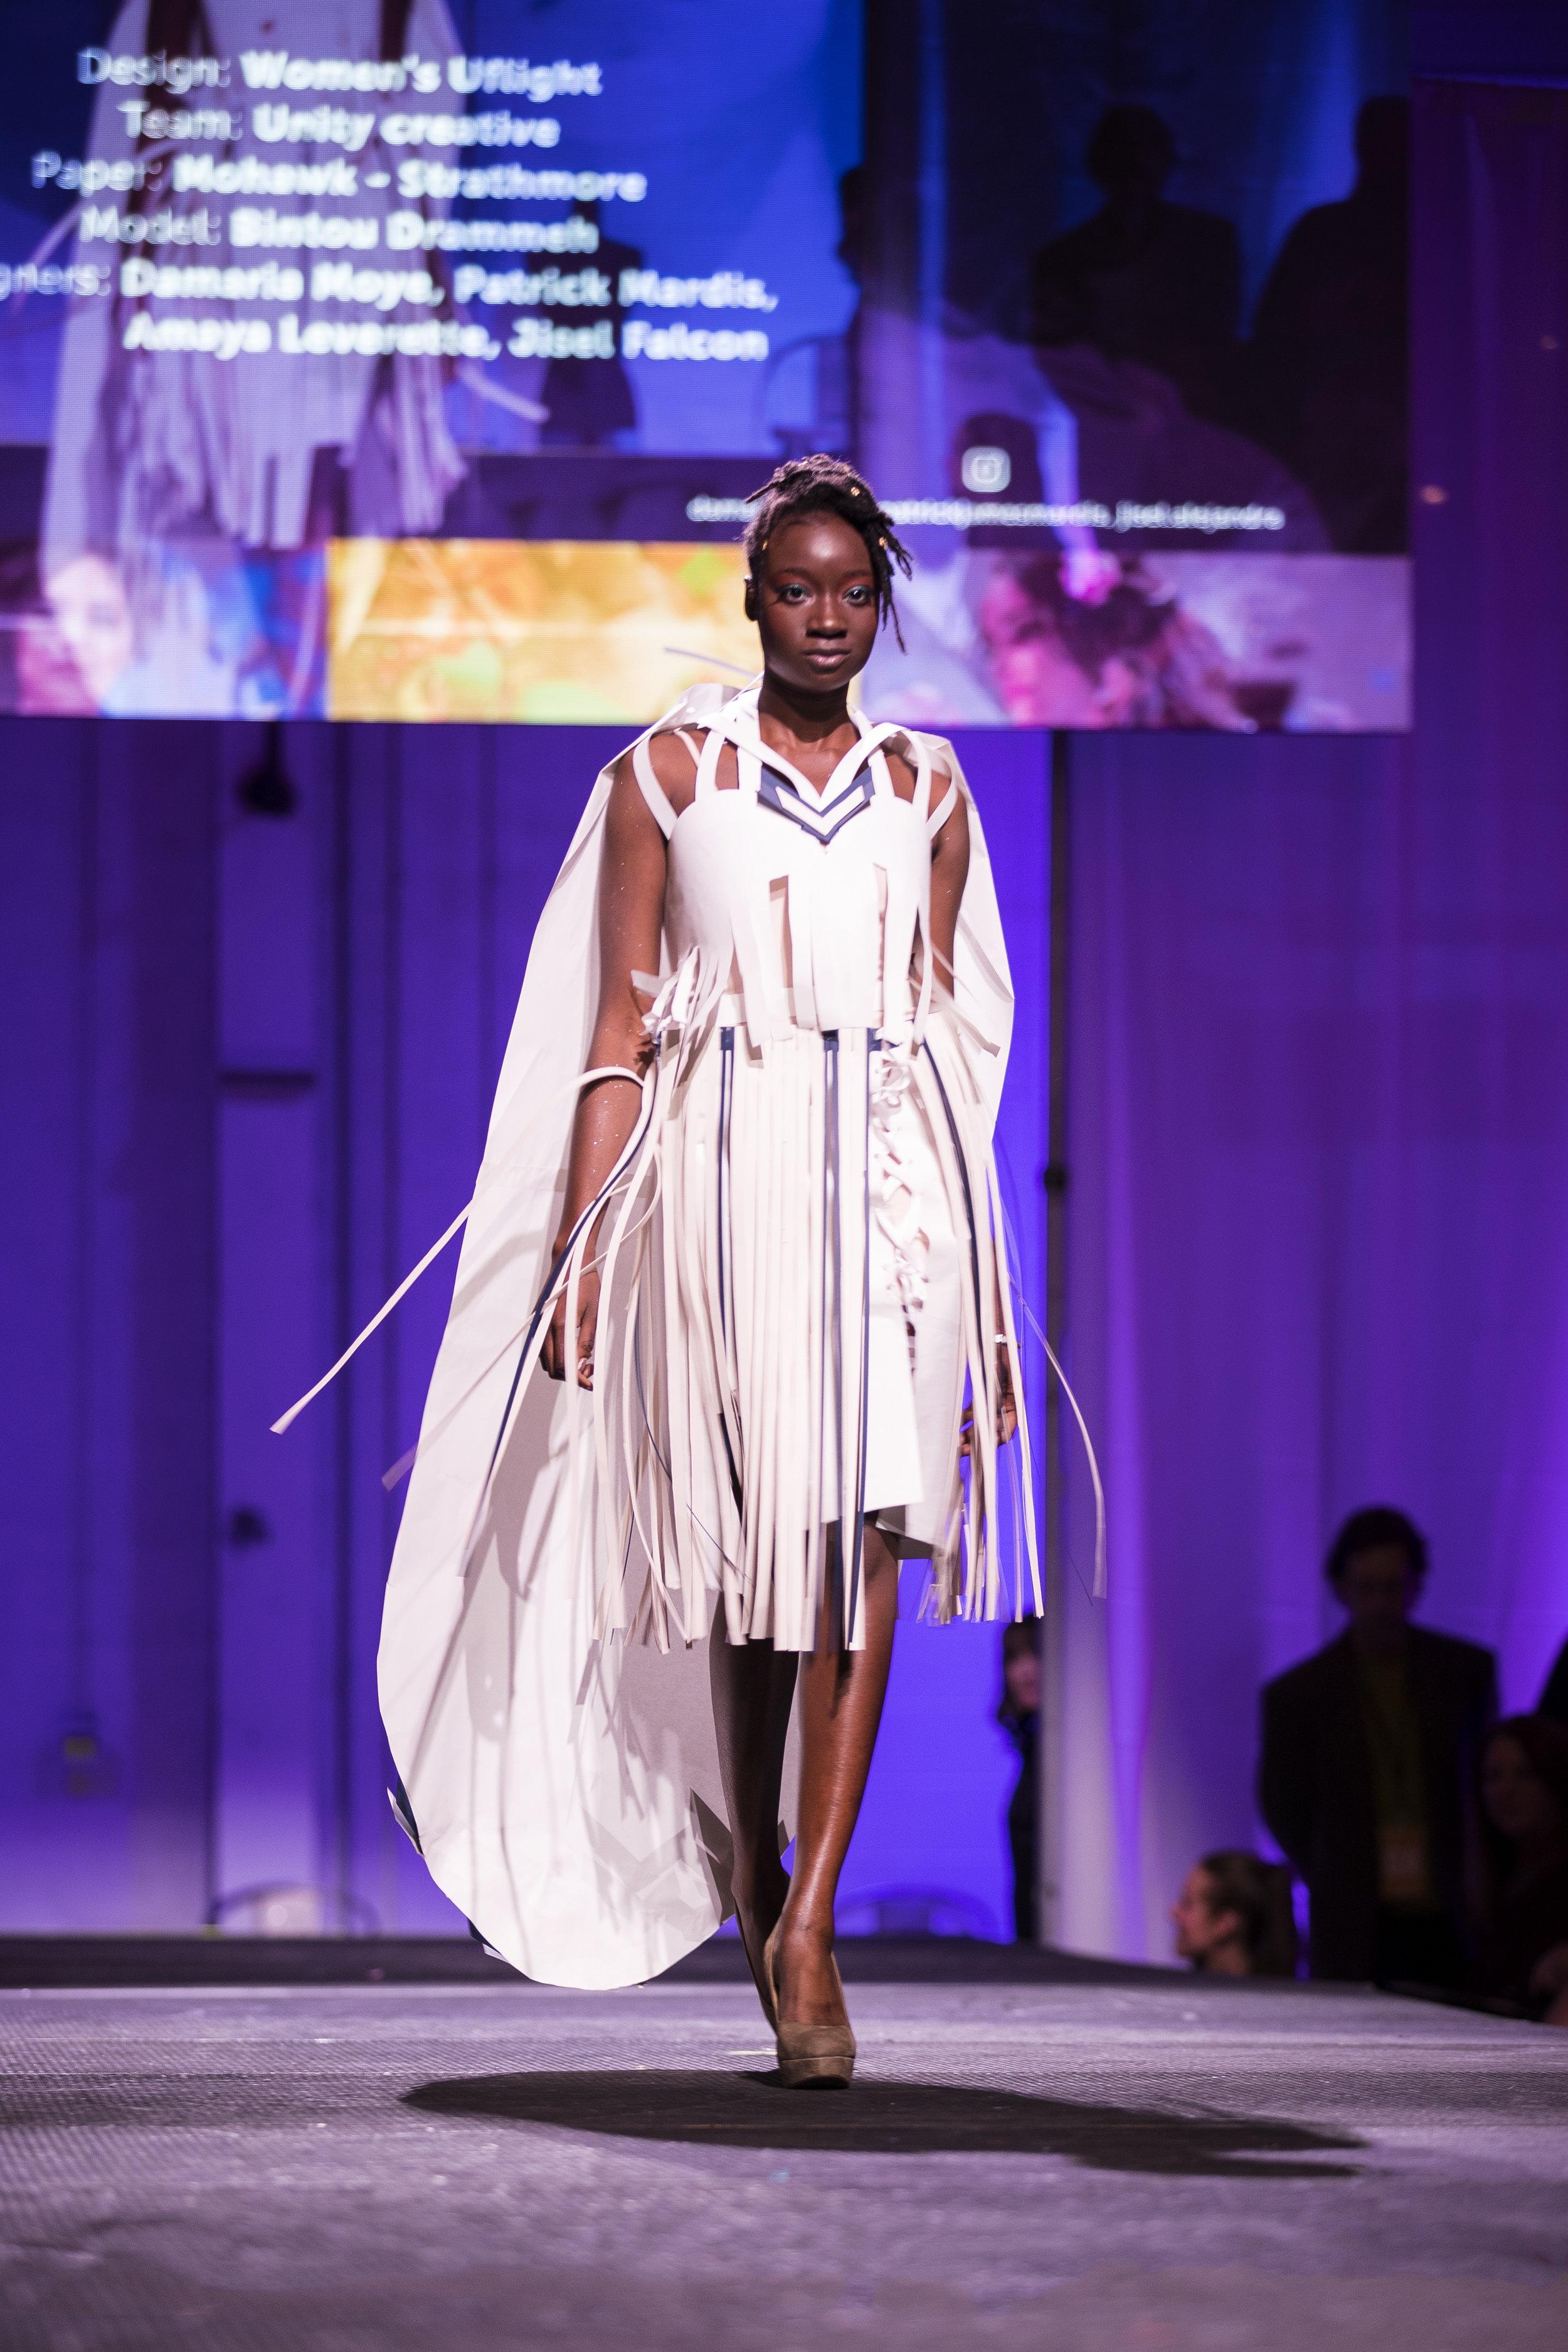 Paper Fashion Show 2019 - 047.jpg